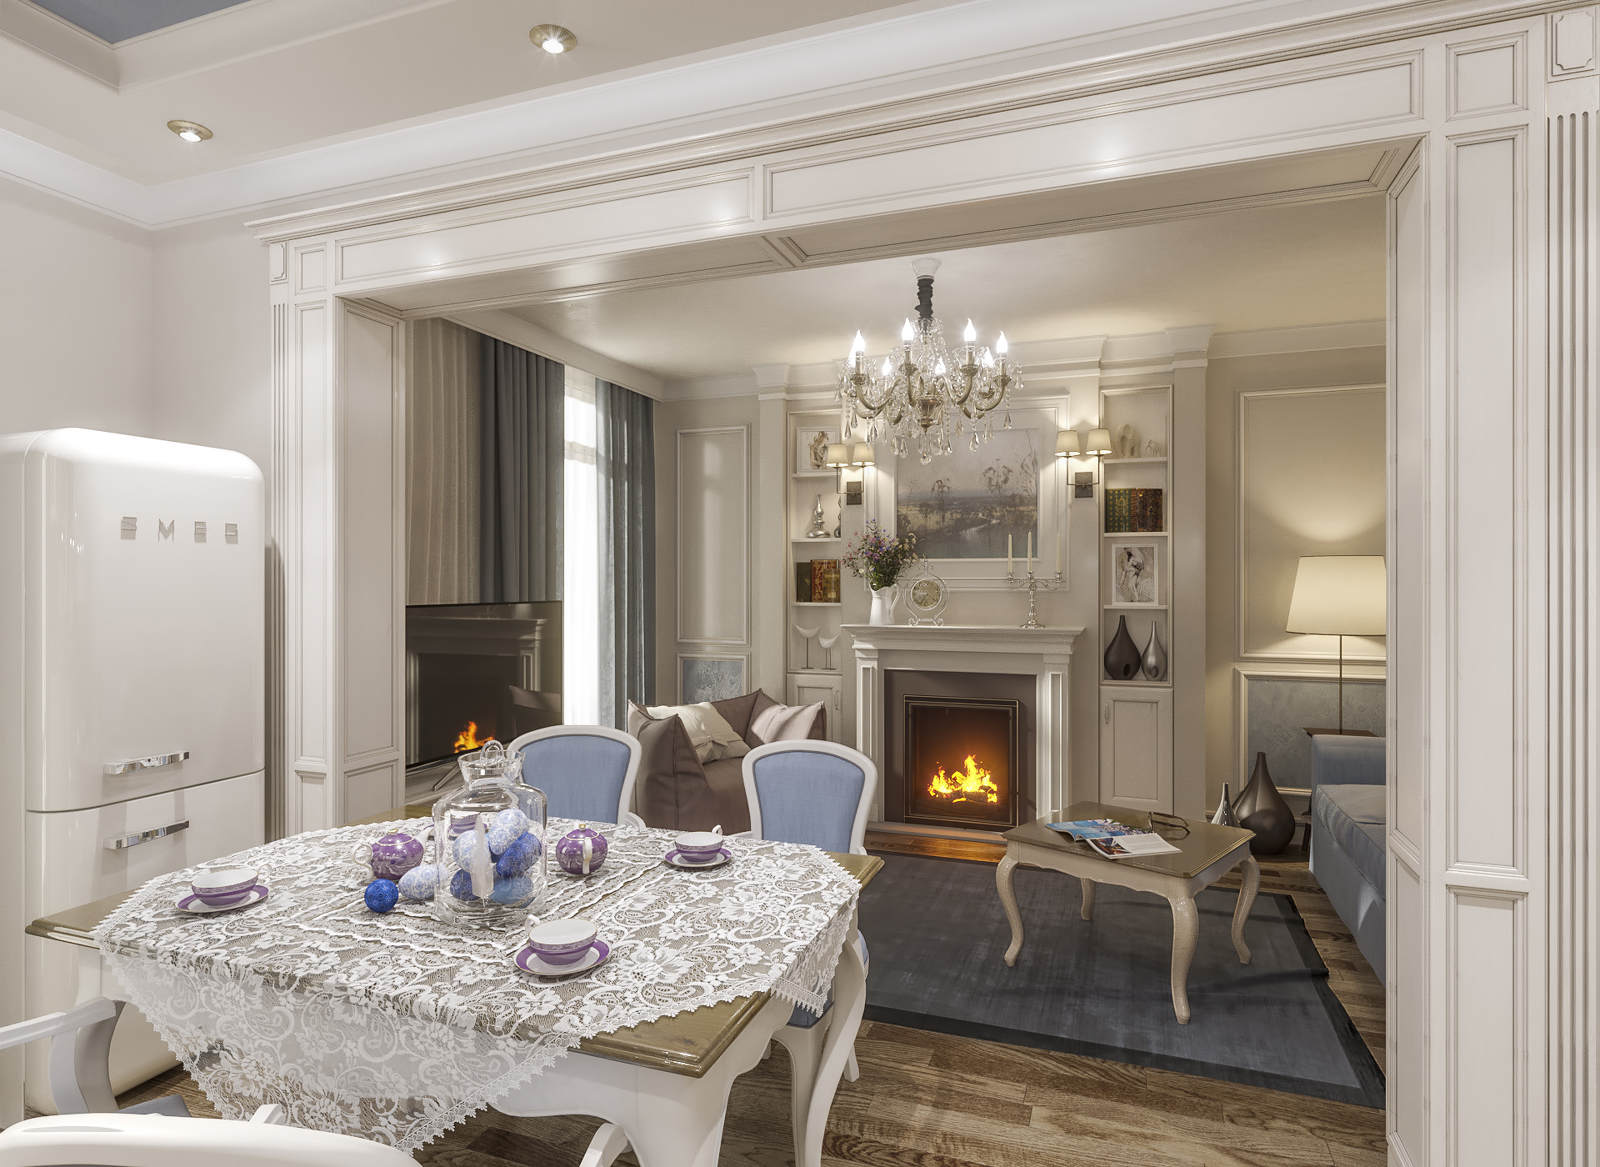 Дизайн гостинной в стиле прованс, класика фото Киев. Камин. ЖК Комфорт таун